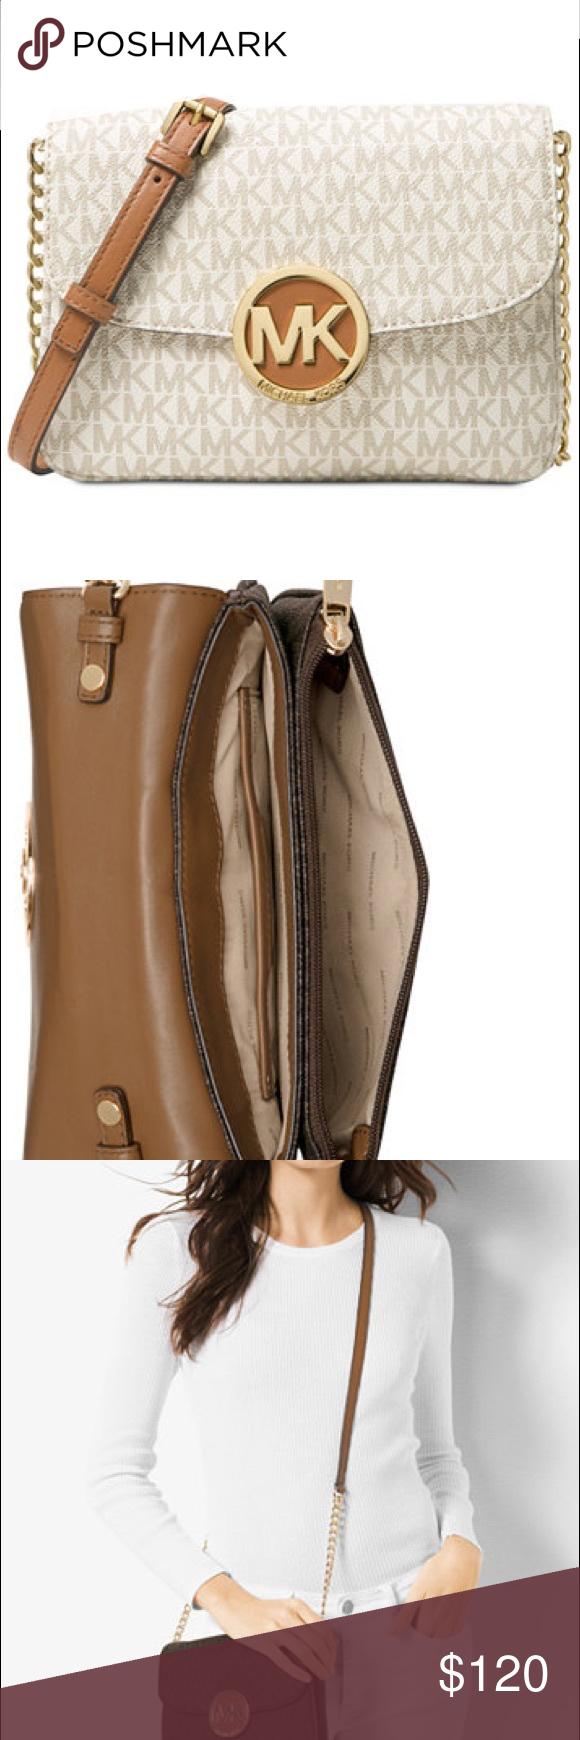 2358464b39e5 Michael Kors Vanilla Fulton Crossbody Bag Authentic Signature Michael Kors  Small Fulton Gusset Flap Crossbody Bag